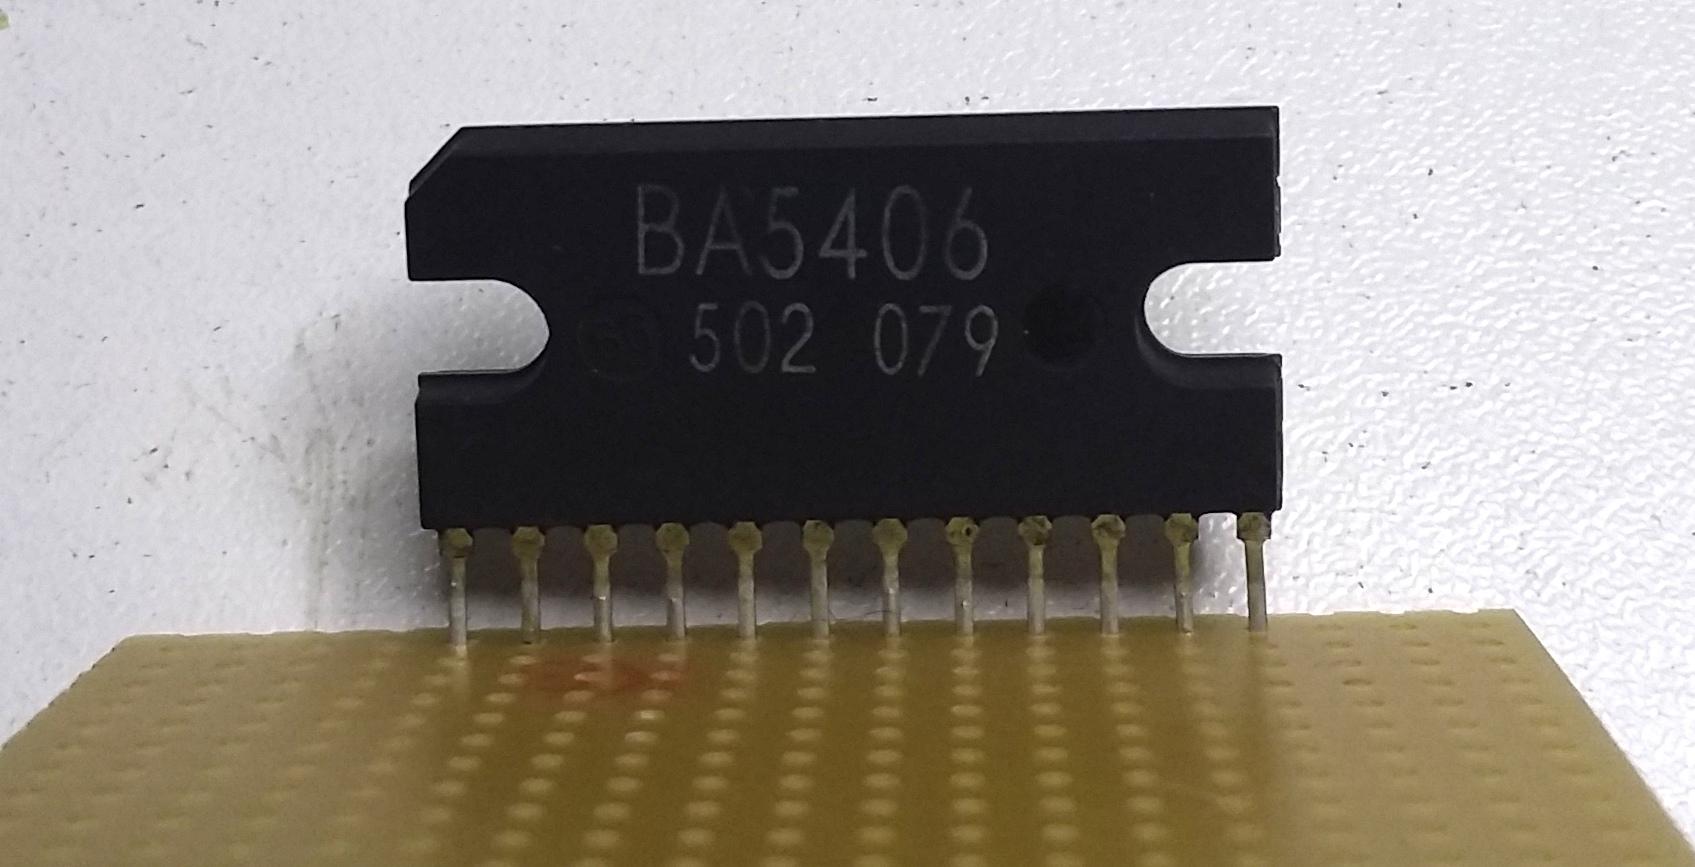 Ampli BA5406-01